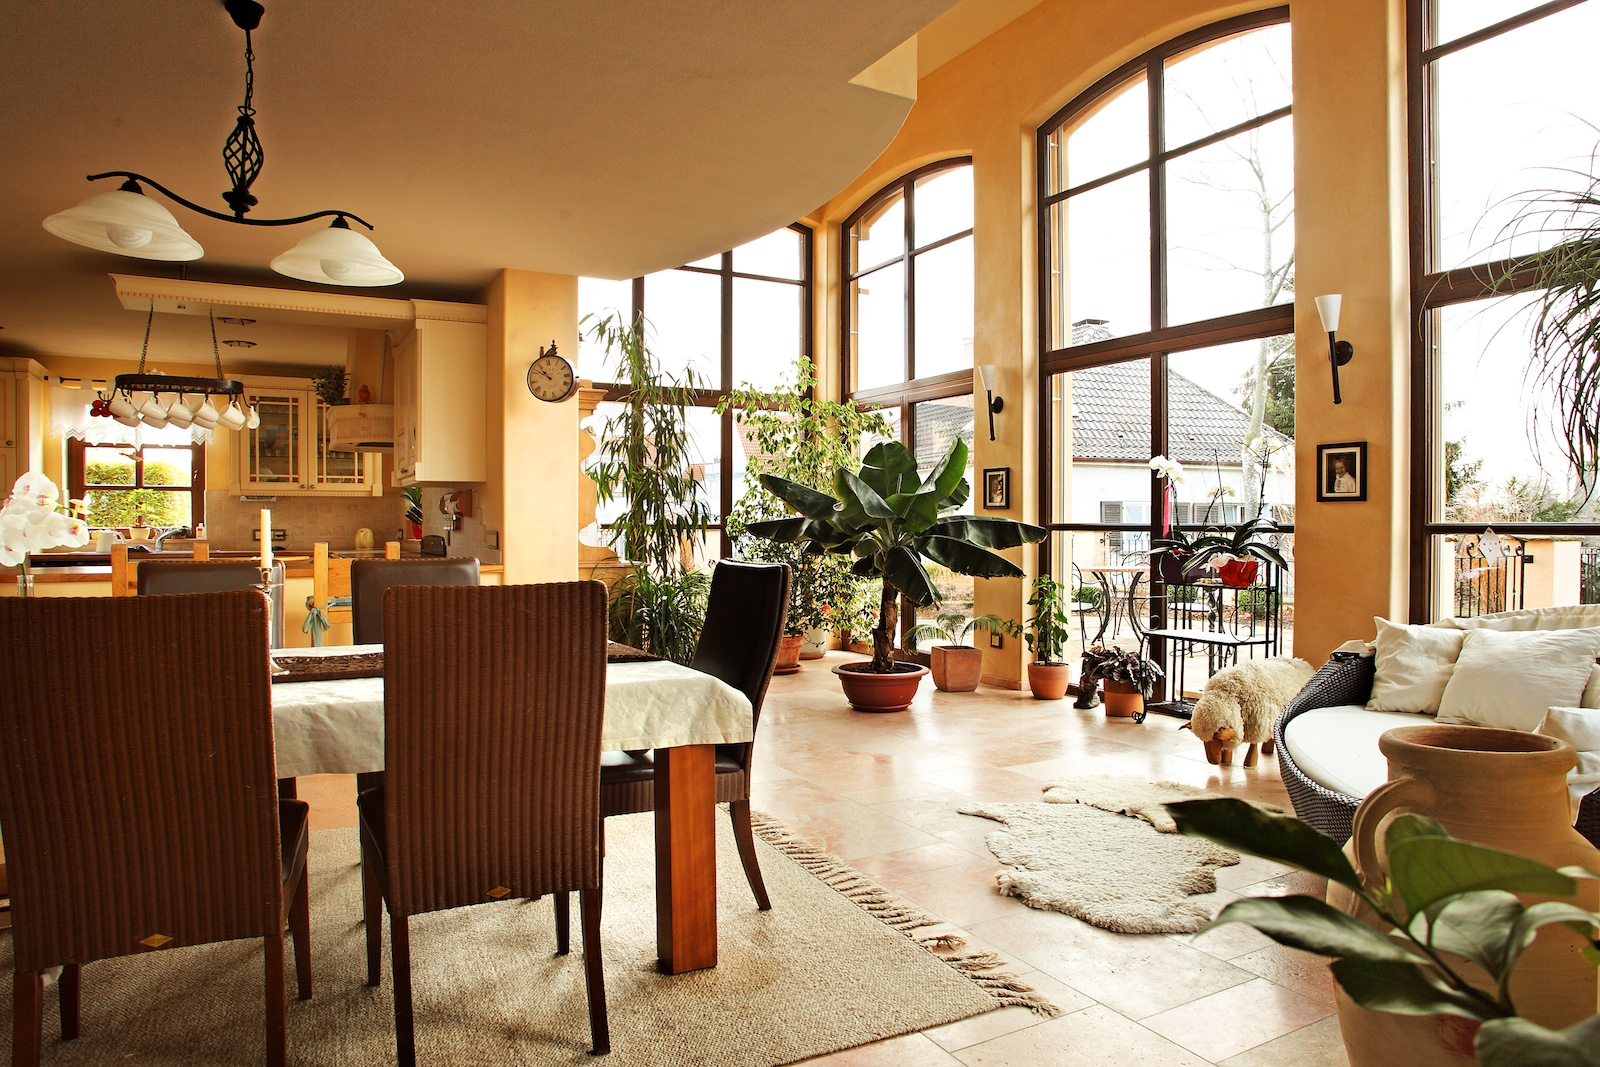 altbau sanierung. Black Bedroom Furniture Sets. Home Design Ideas